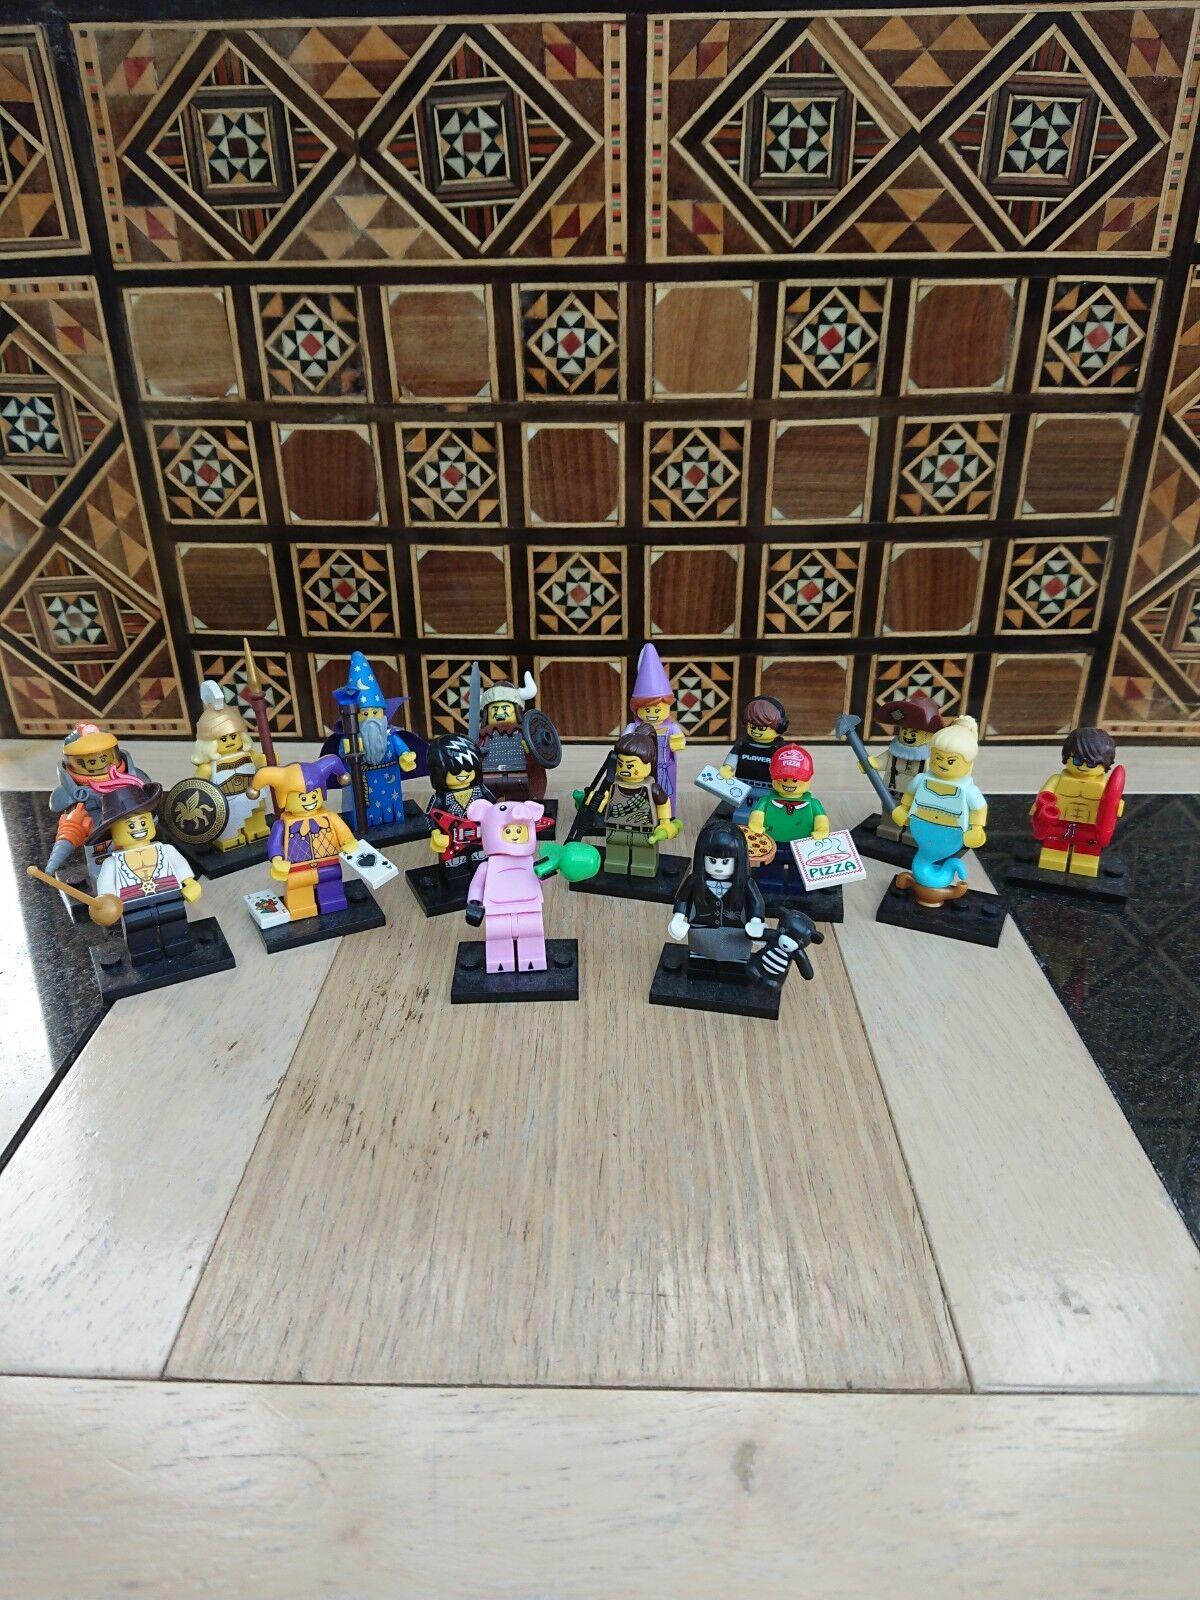 Lego Minifigures Series 12 - Full Set of 16 figures